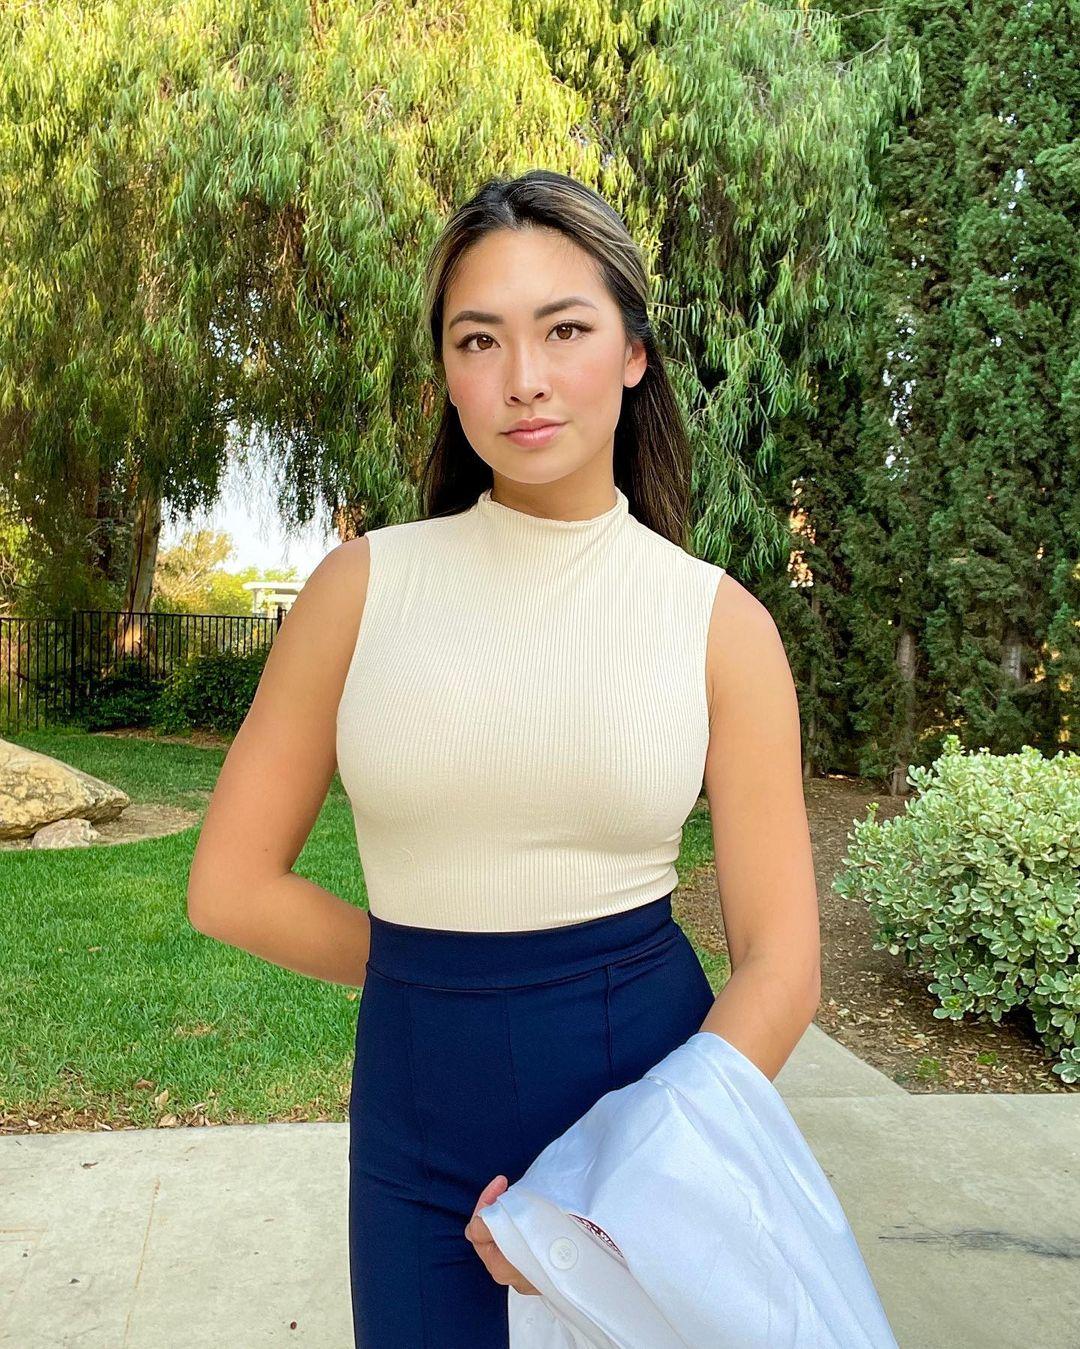 Vivian-Jasmine-Yu-Wallpapers-Insta-Fit-Bio-9